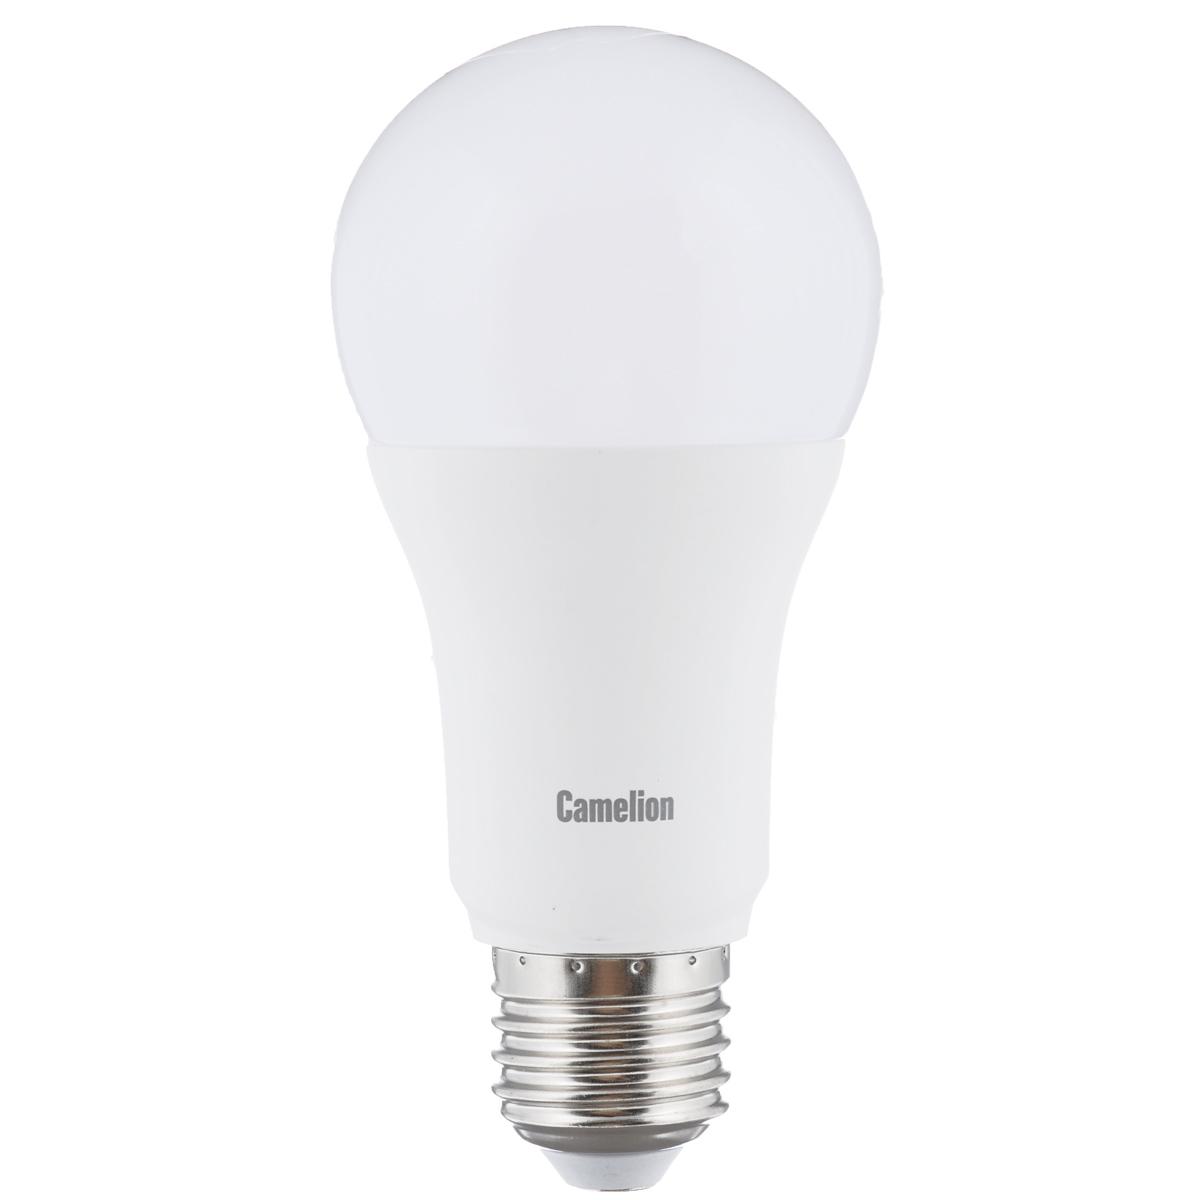 "Светодиодная лампа Camelion ""Led Ultra"", теплый свет, цоколь E27, 12 W"